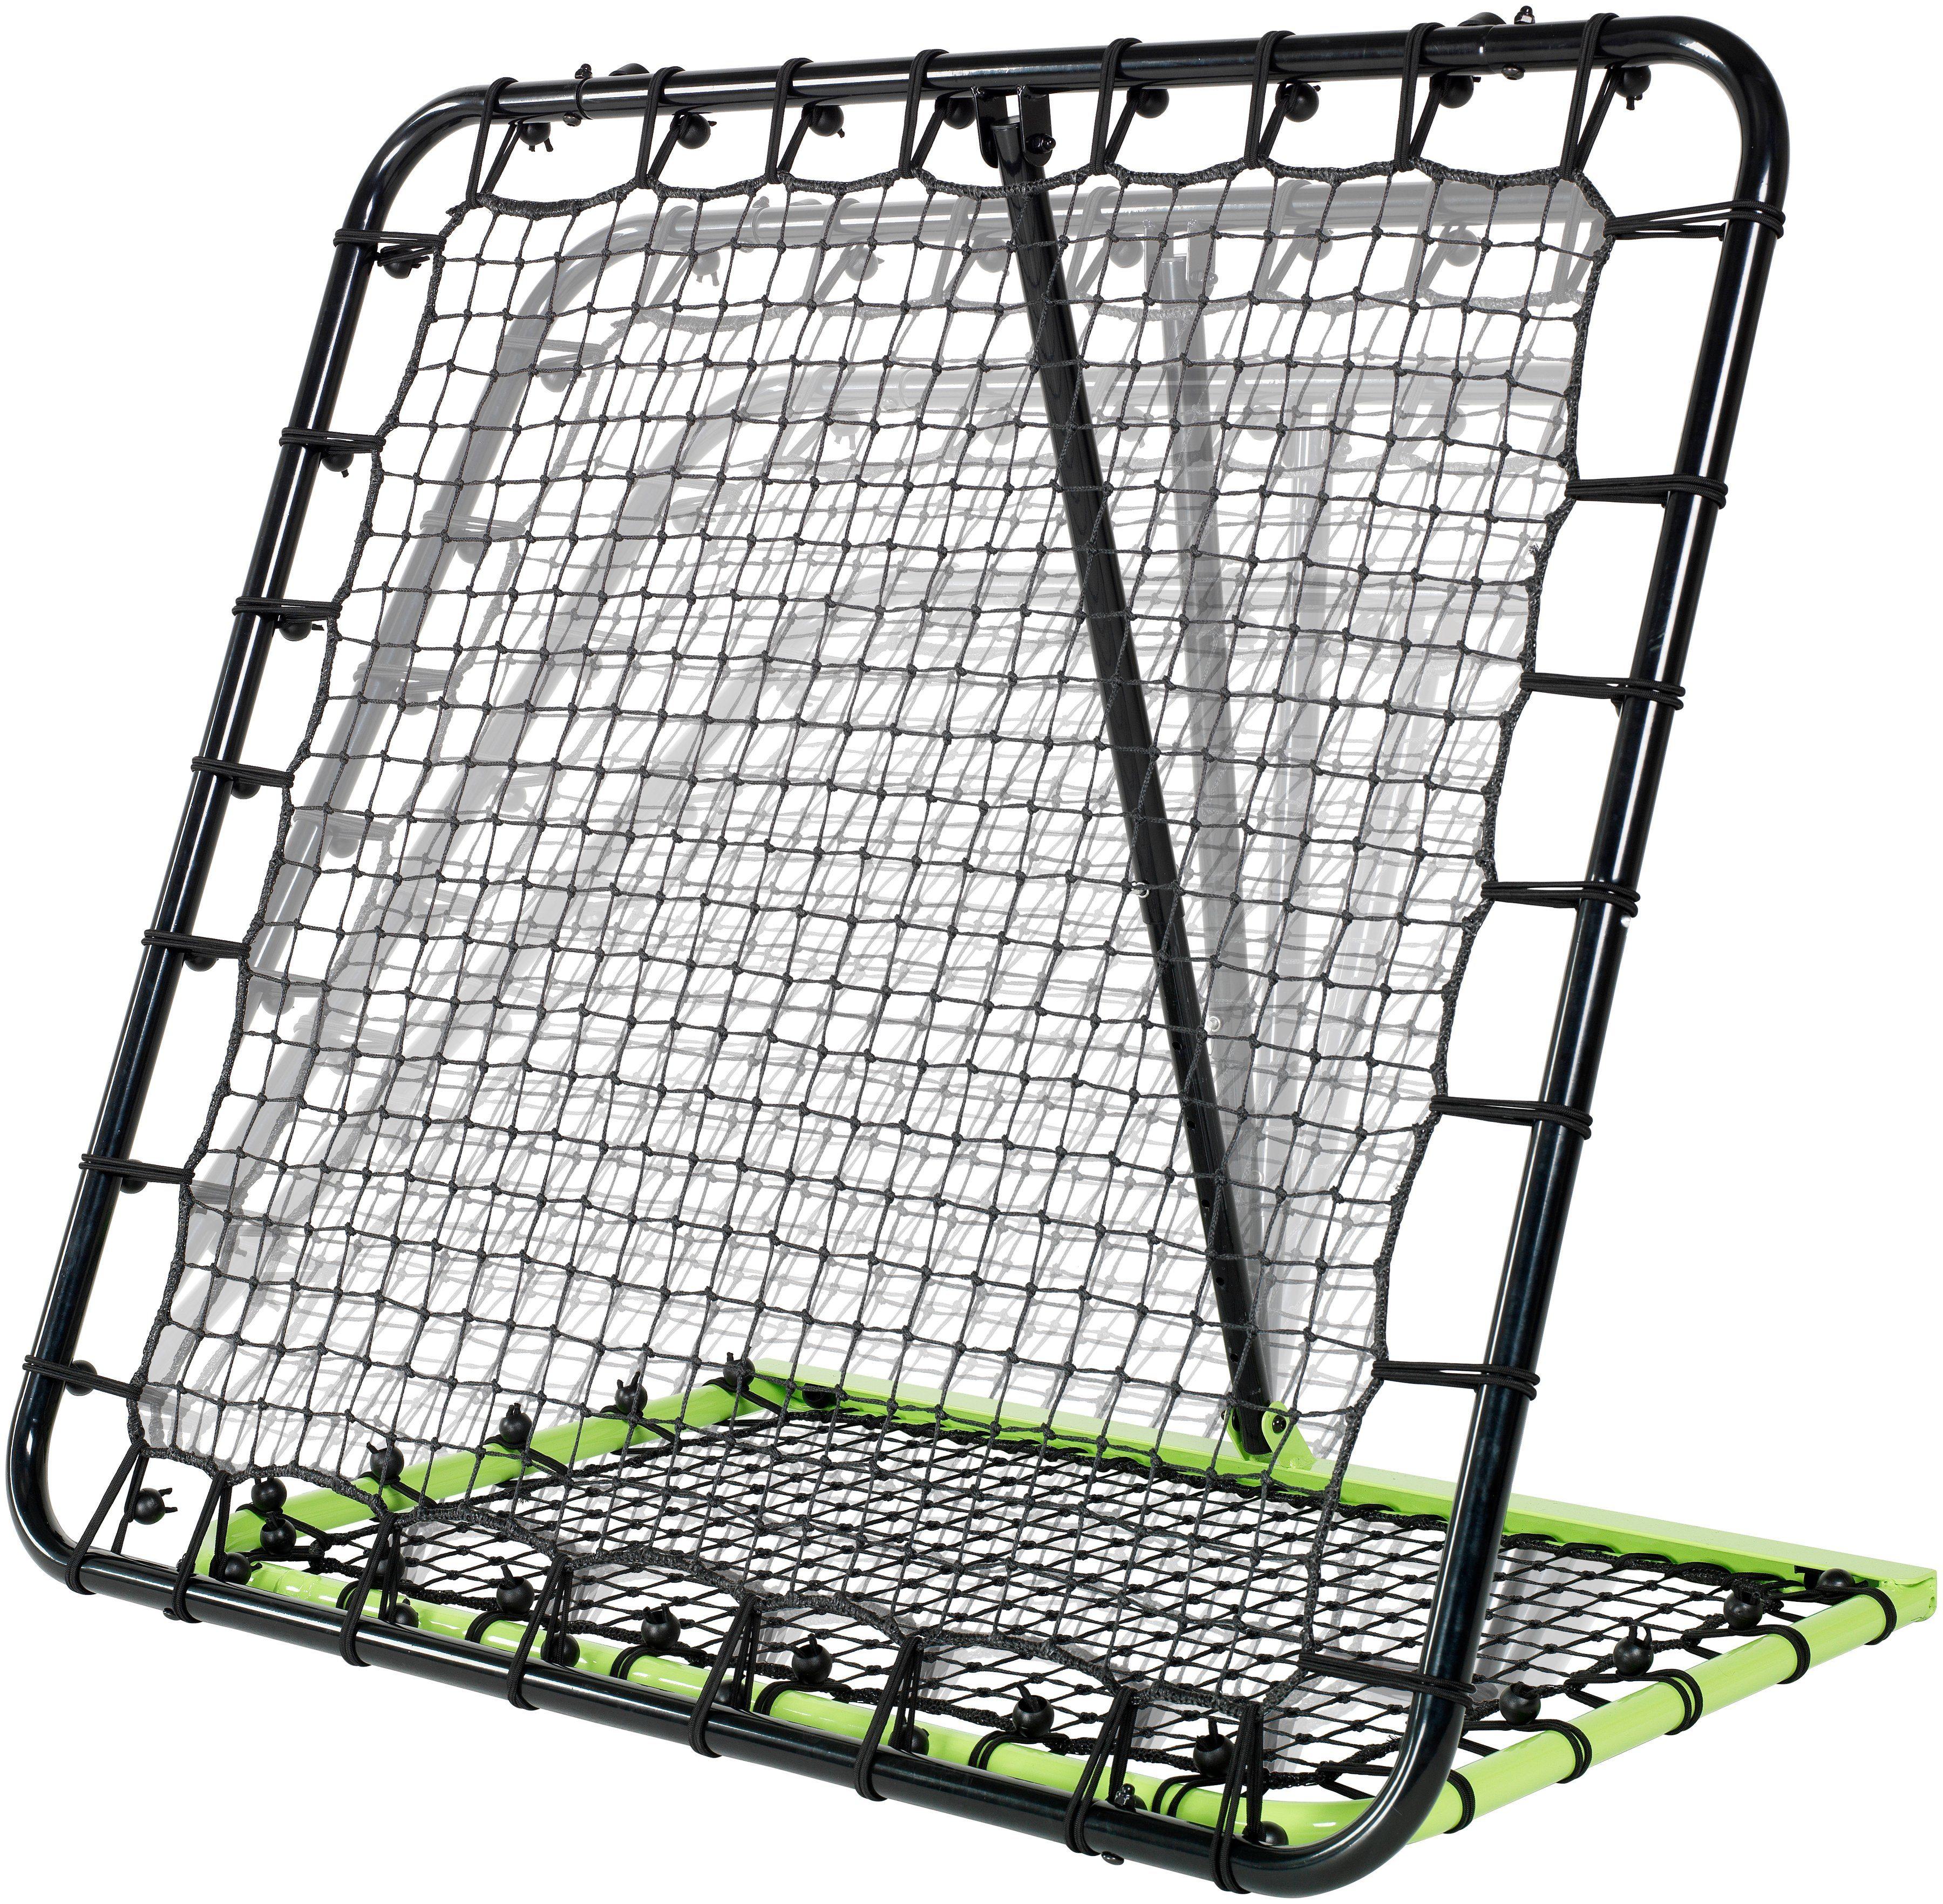 EXIT Rebounder »Kickback Omni-Trainer«, BxH: 120x114 cm